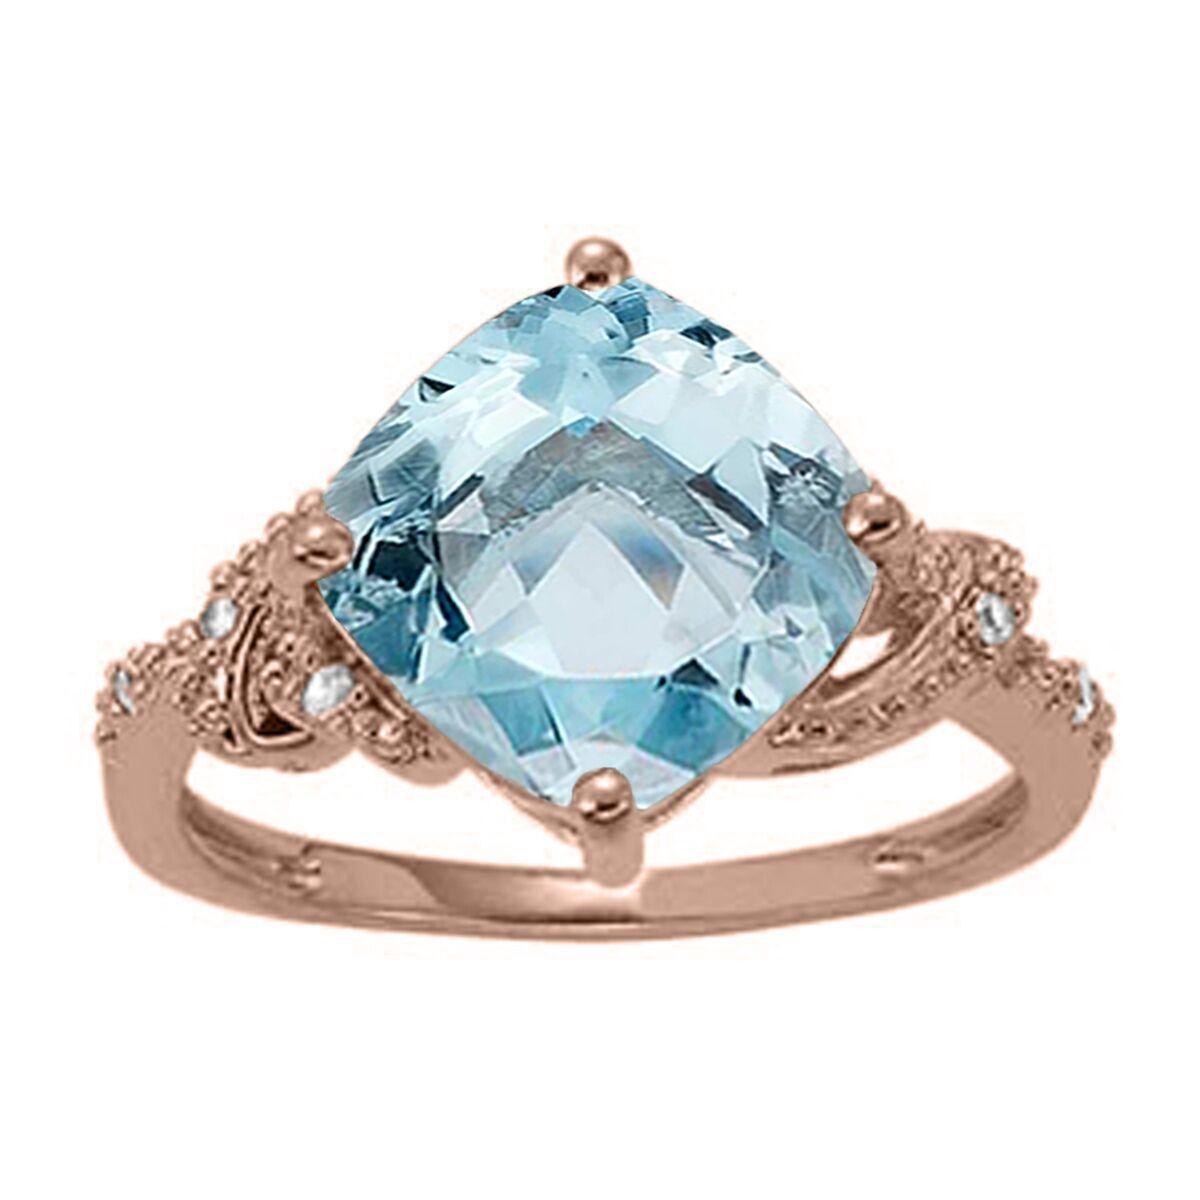 3.25 Ct. Ttw Diamond And Cushion Cut Aqumarine Ring In 10K gold